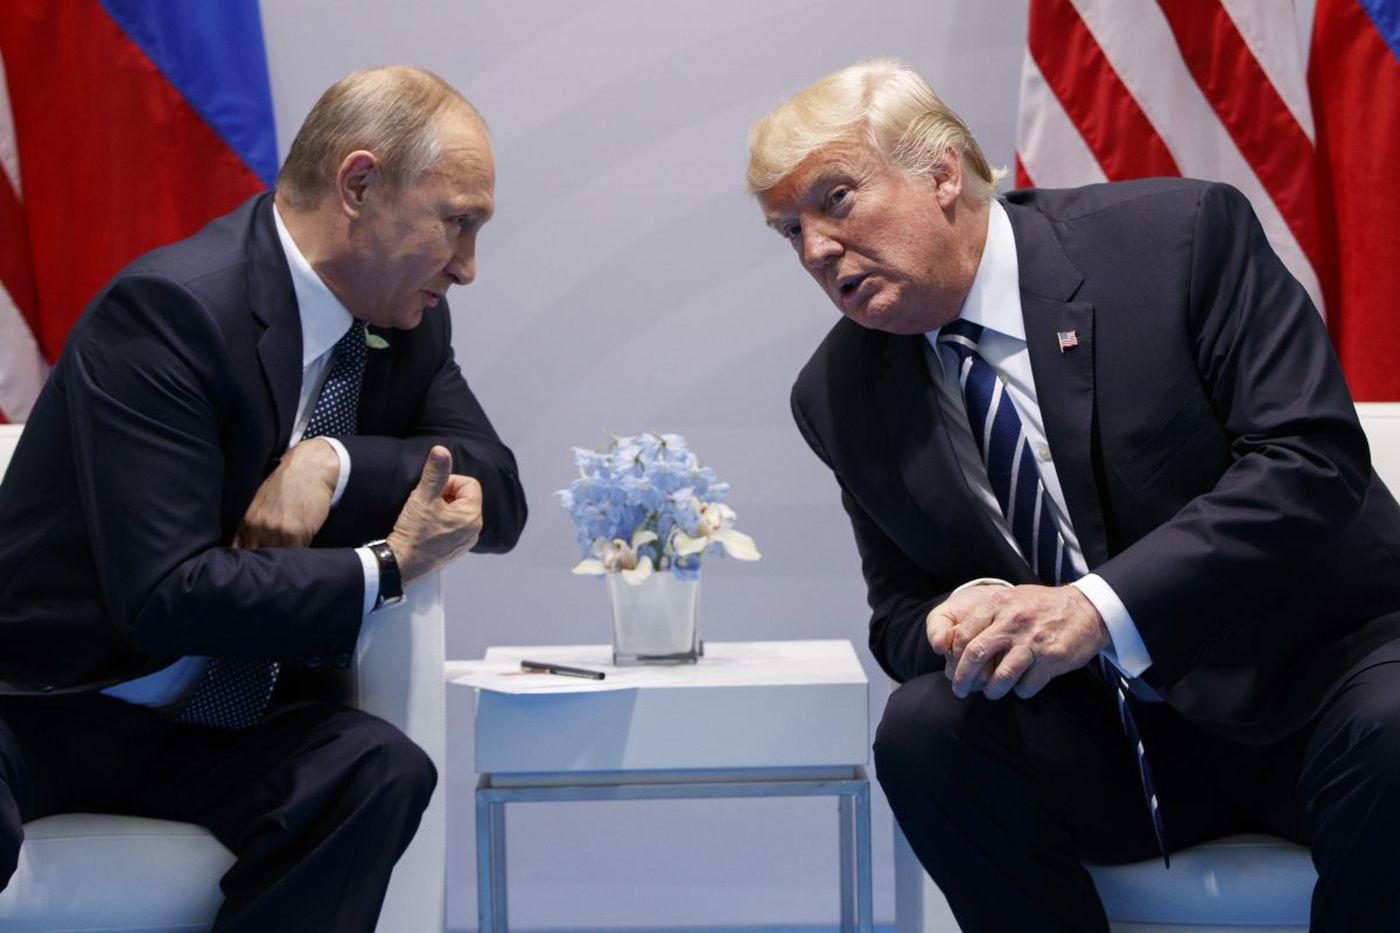 Trump's weak response to Moscow attacks boosts Putin I Trudy Rubin